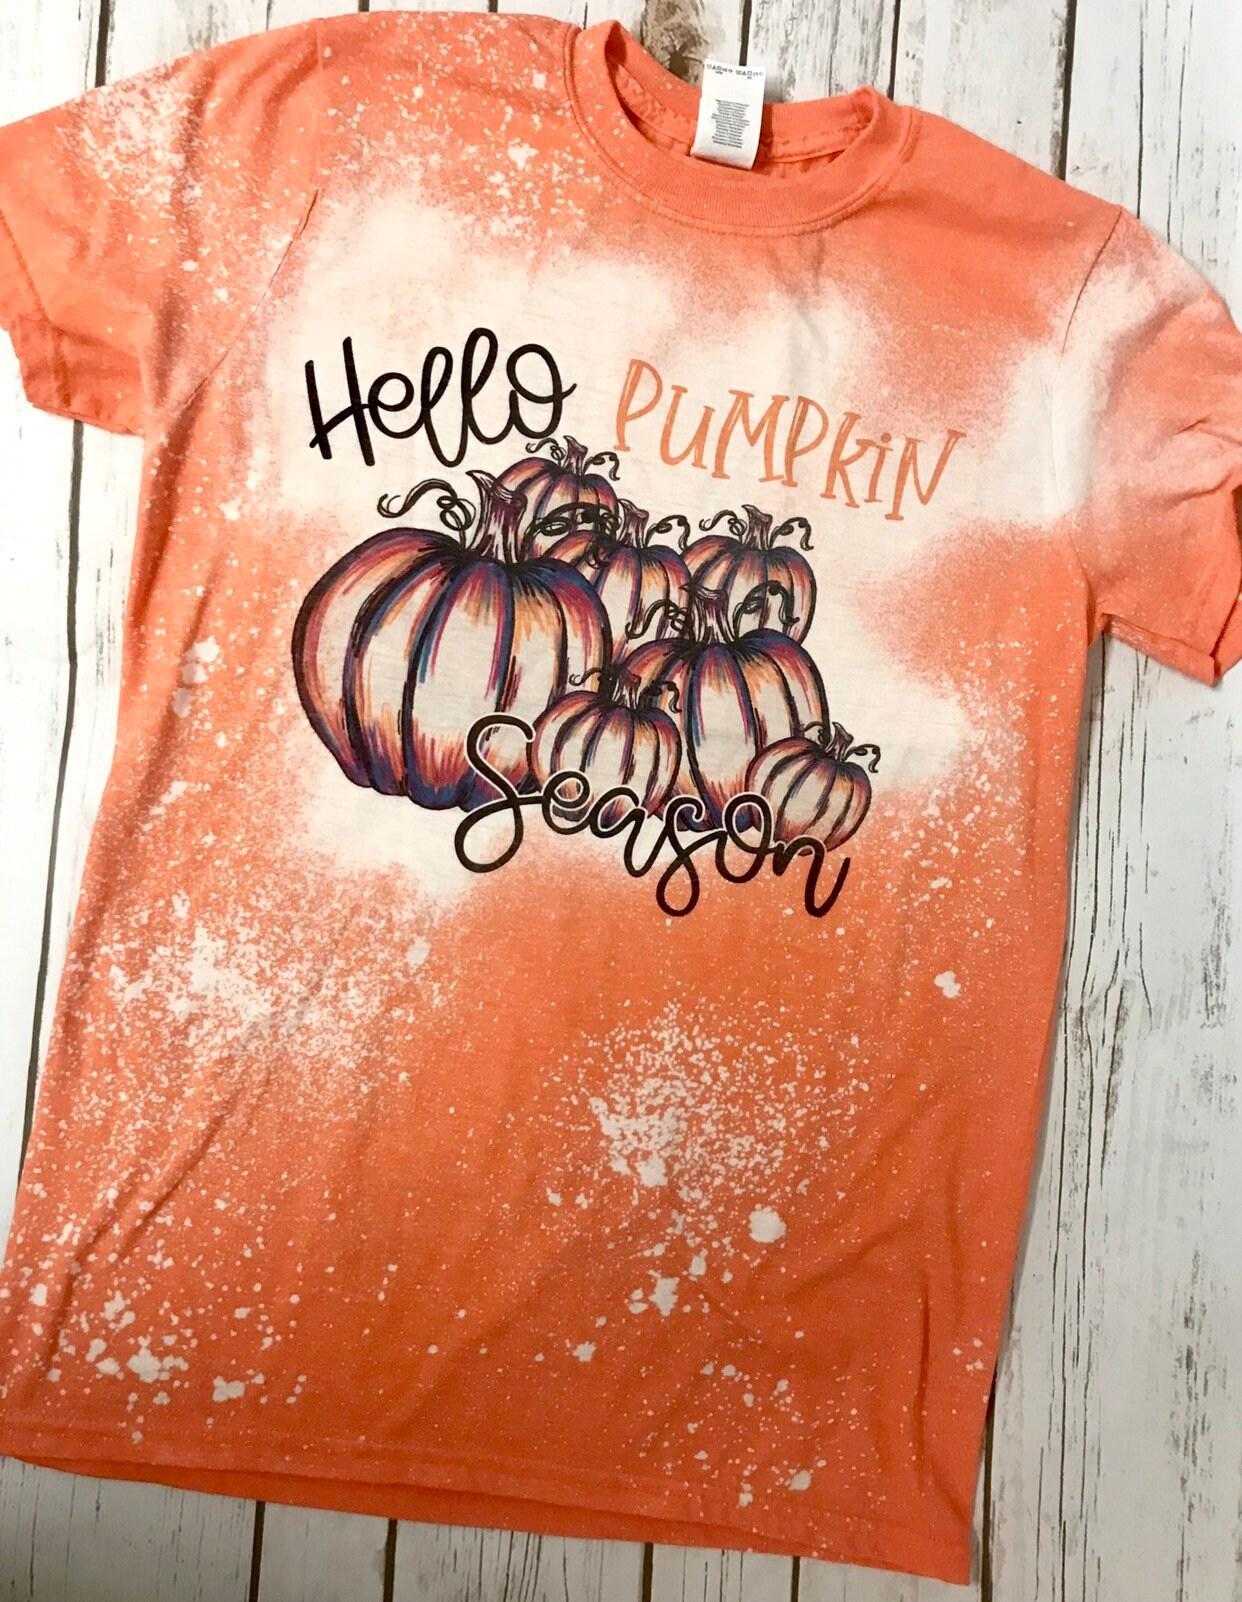 basic shirt fall starbucks pumpkin spice shirt It\u2019s the season to be basic shirt